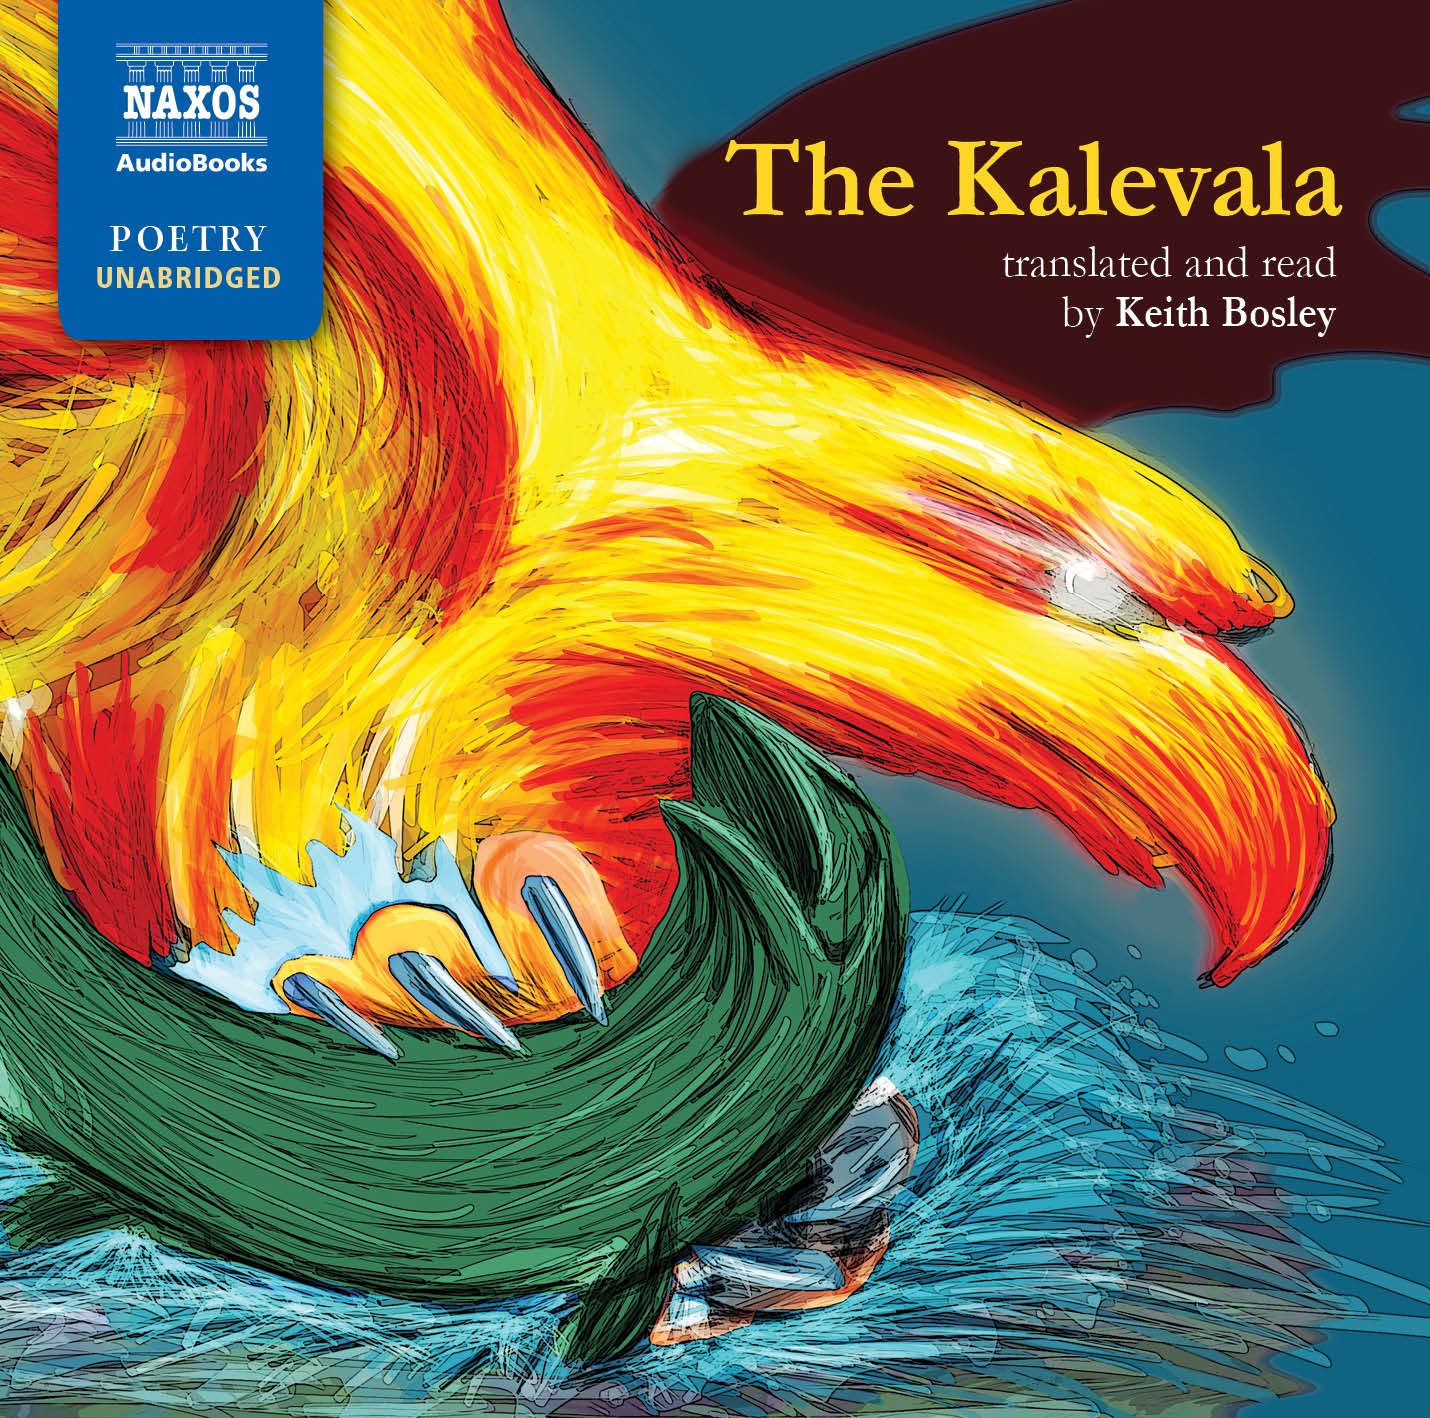 The Kalevala (Naxos Poetry) by Naxos AudioBooks